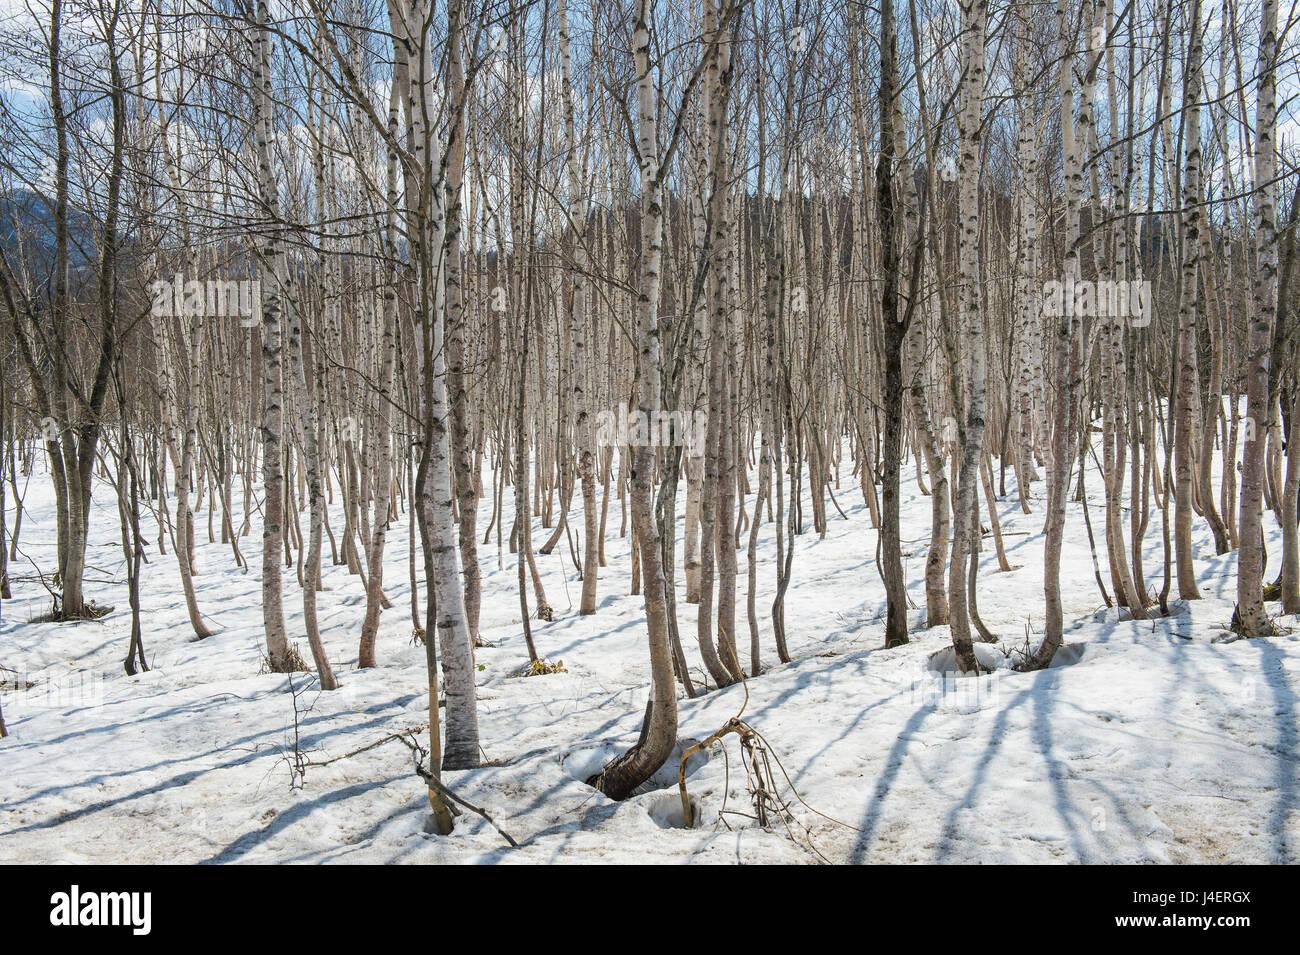 Birch tree forest, Furano, Hokkaido, Japan, Asia - Stock Image